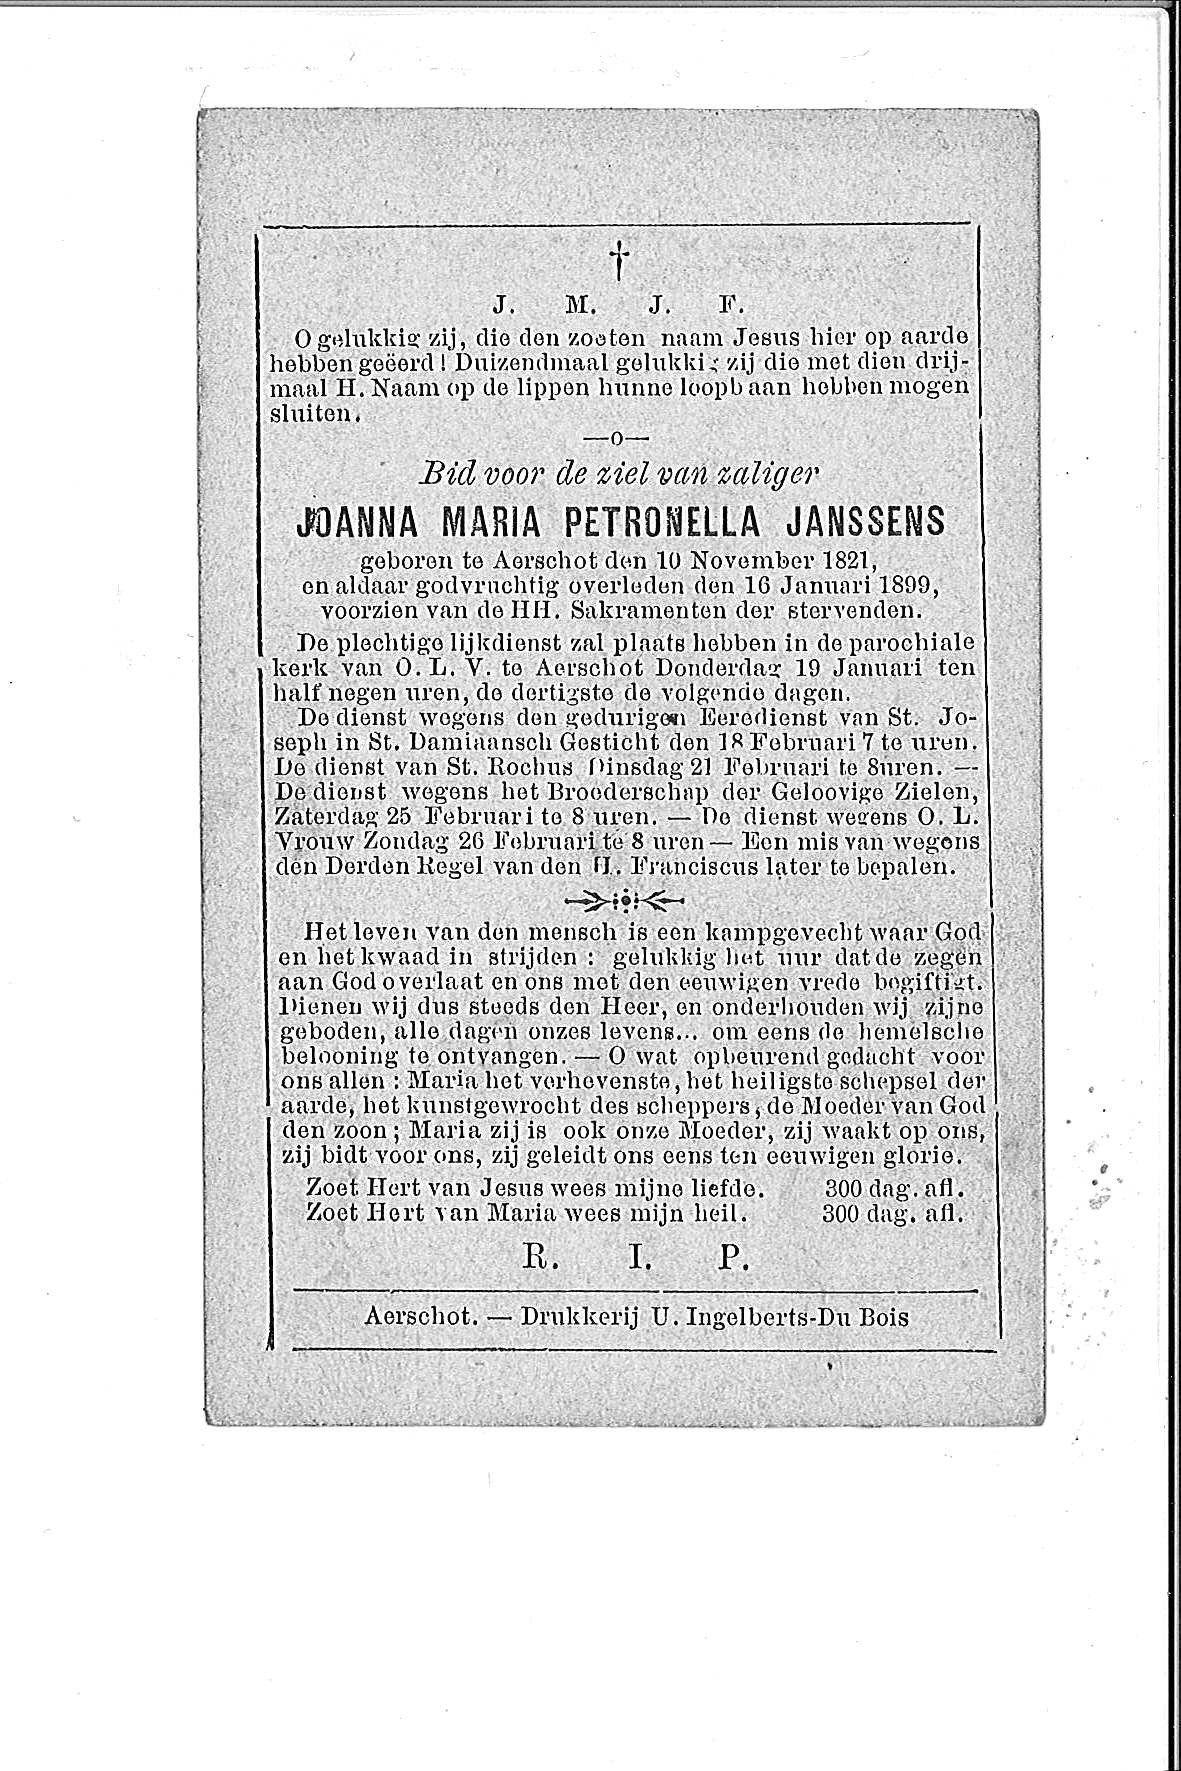 Joanna-Maria-Petronella(1899)20150420104827_00025.jpg